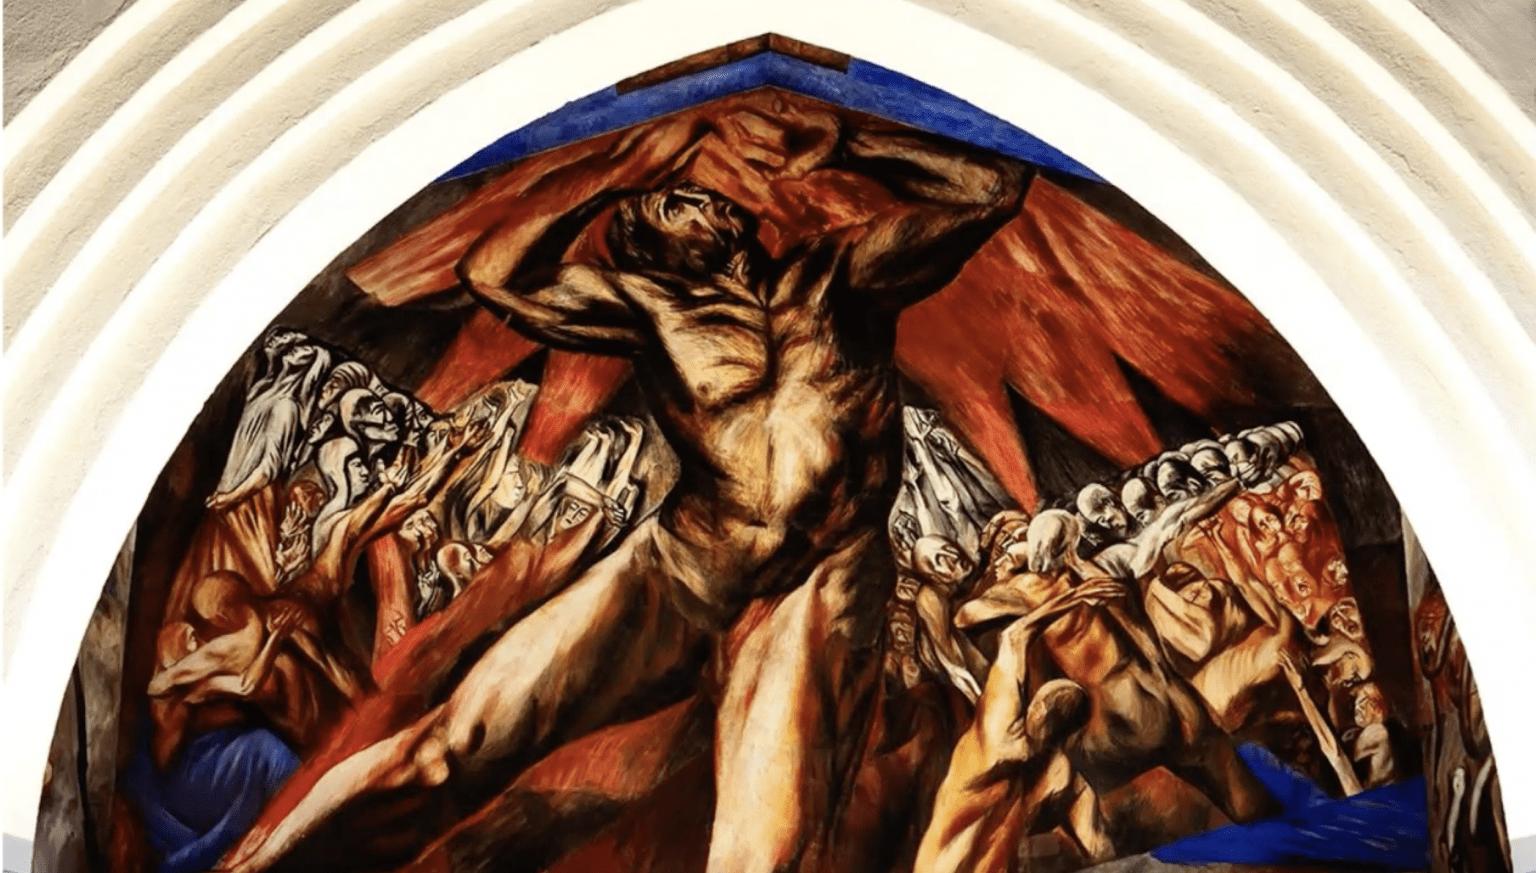 painting of Prometheus